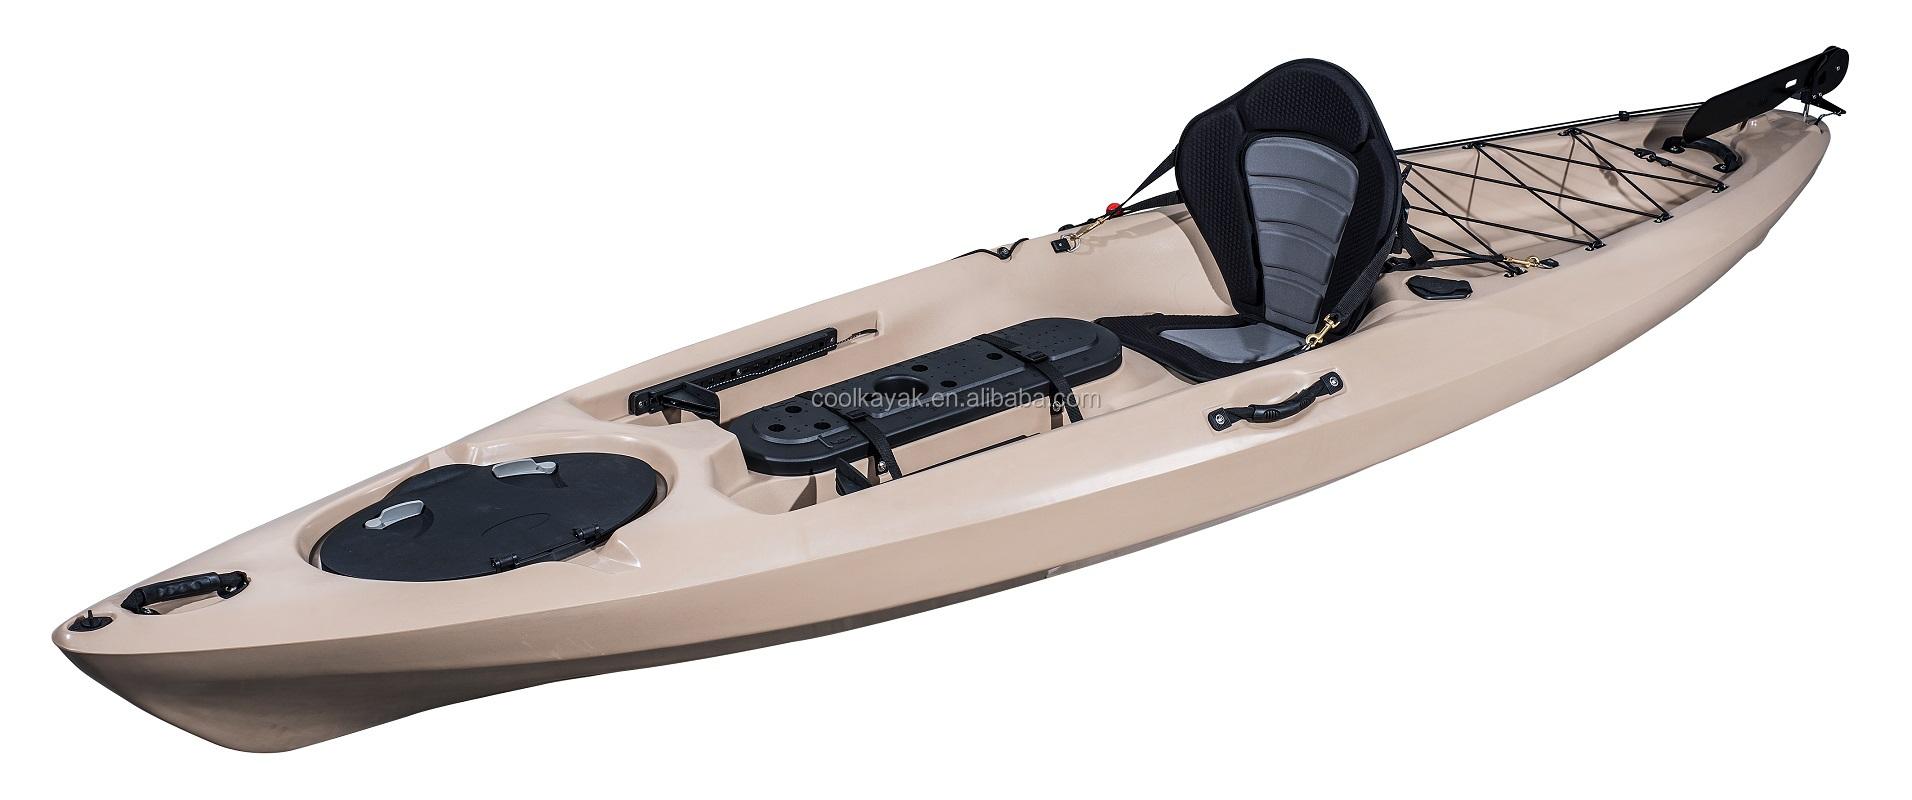 Cool Kayak Racing Pedal Kayak And Fishing Boat Dace Pro